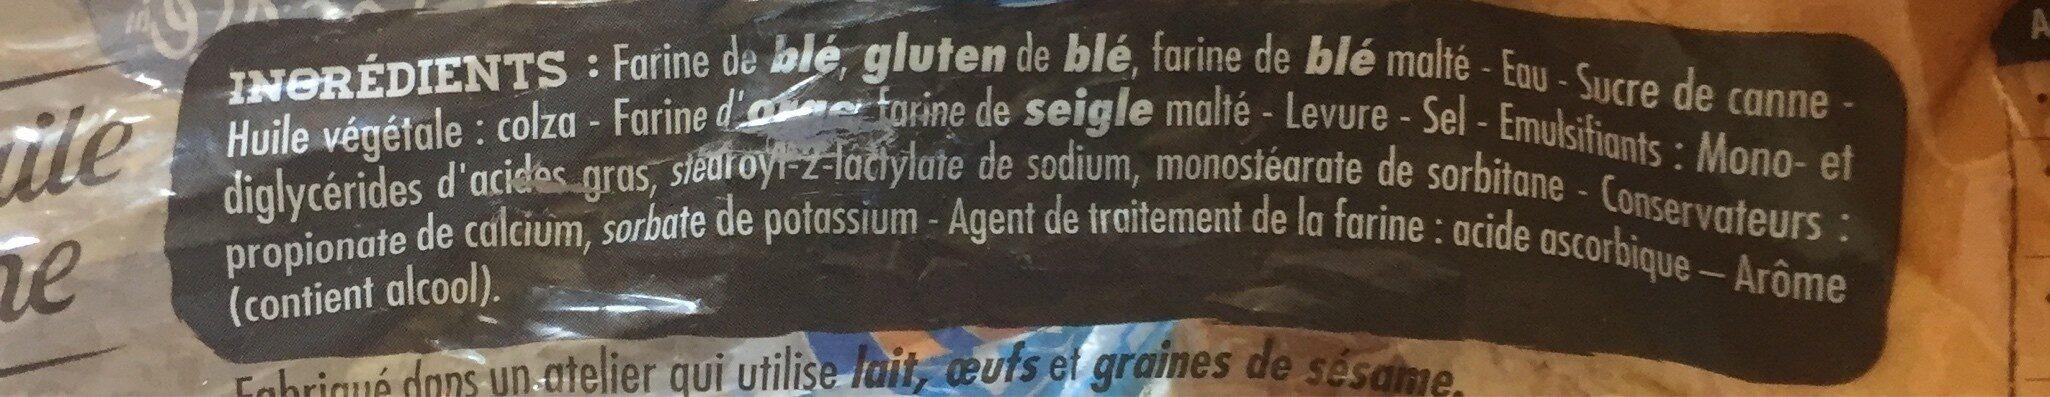 Maxi Burger Nature - Ingrédients - fr